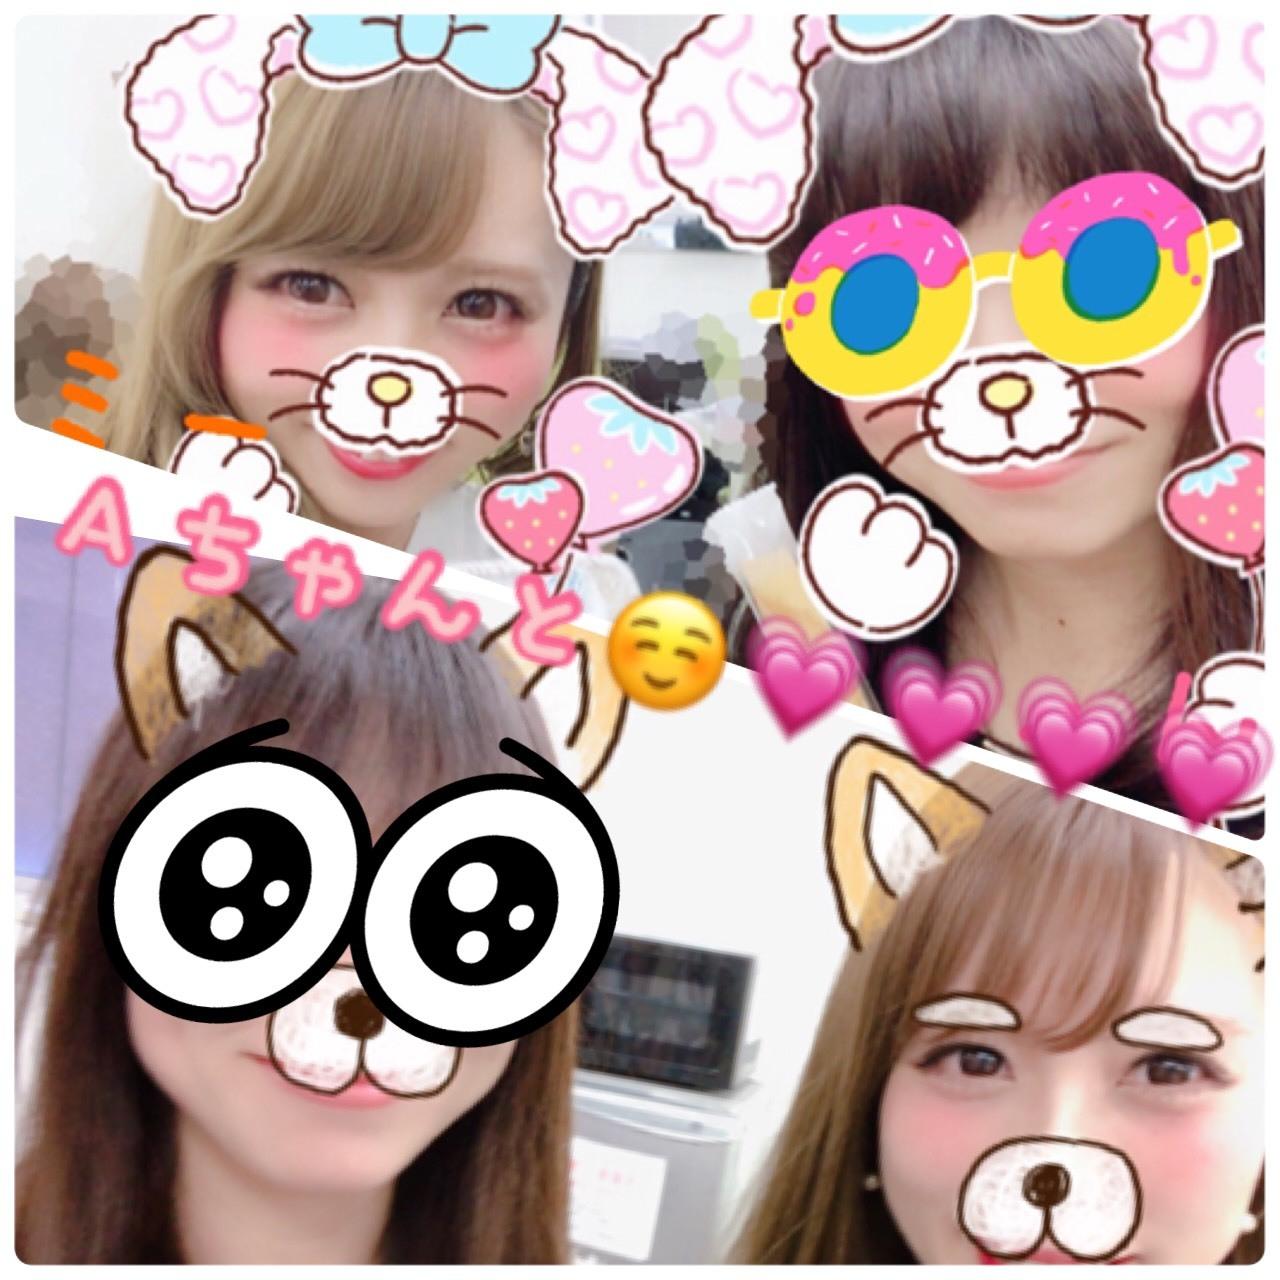 S__14467095.jpg